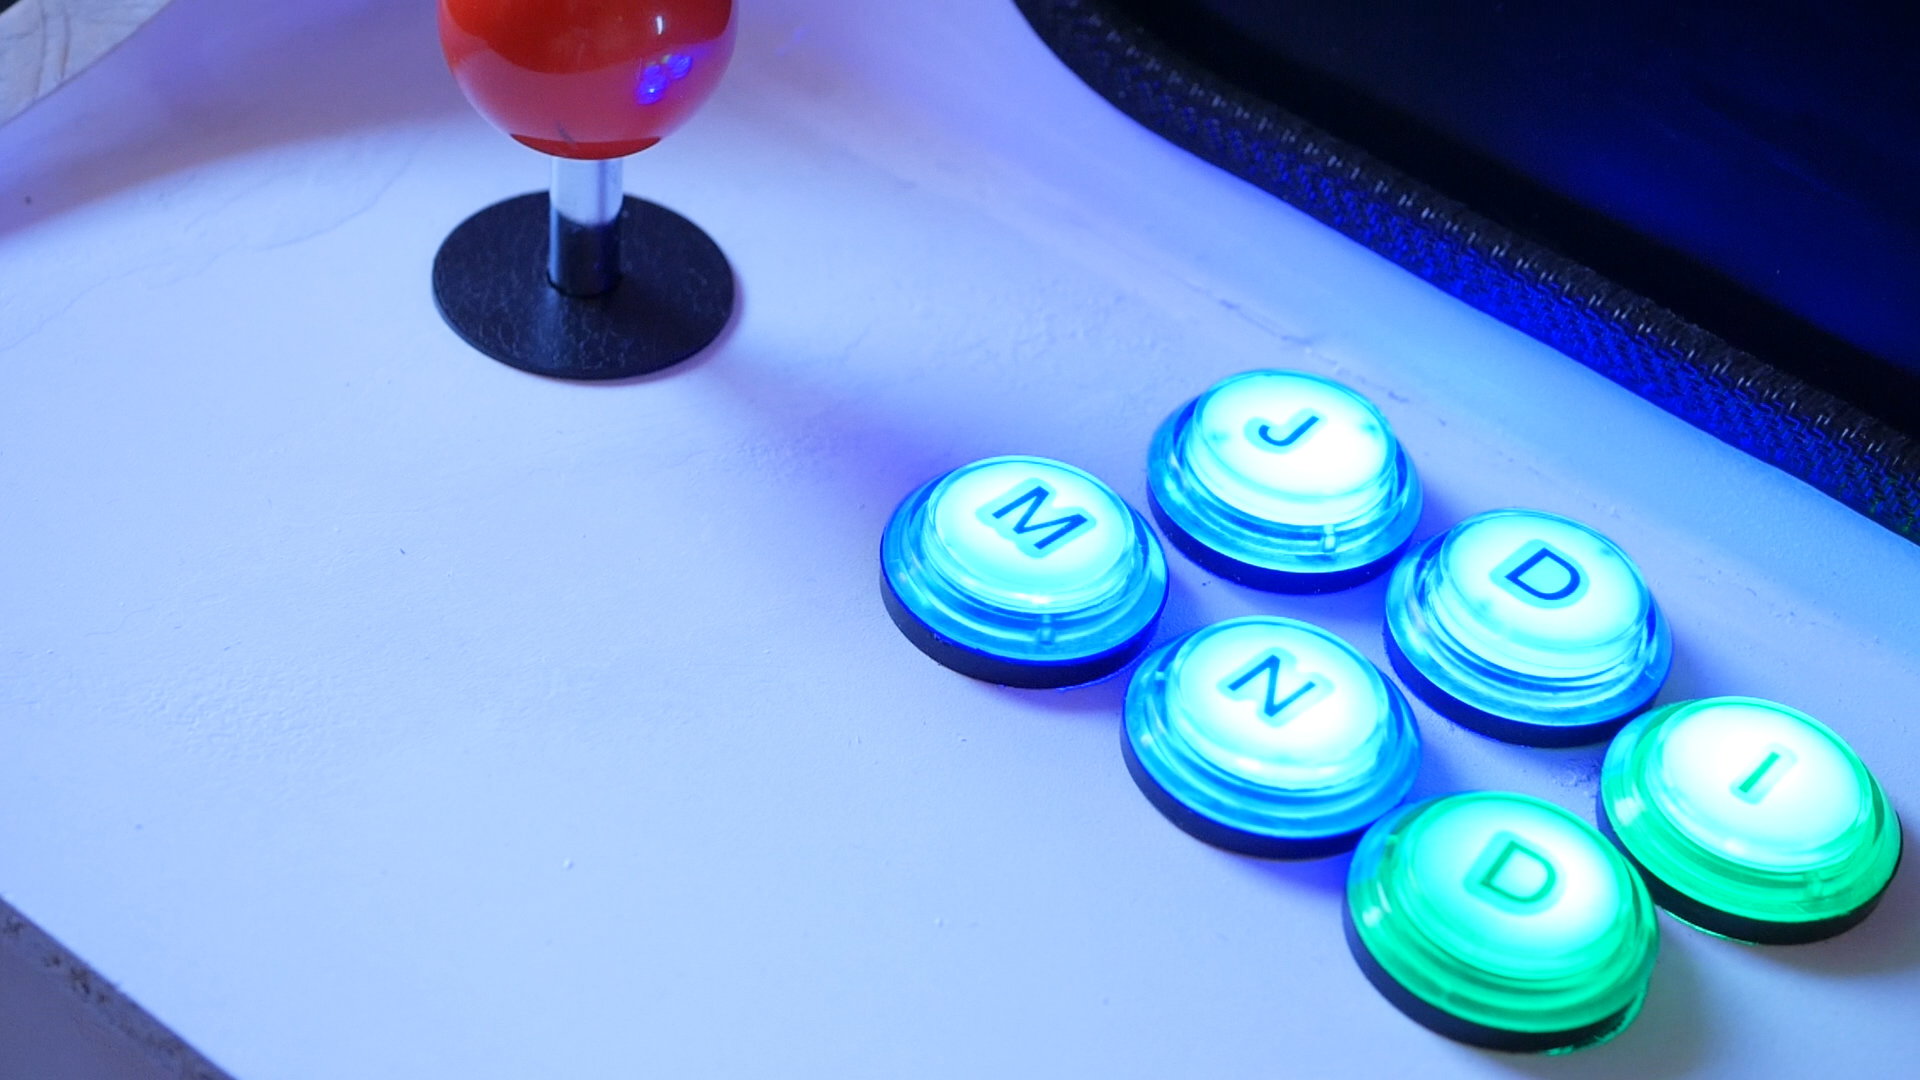 Arcade Automat LED Buttons